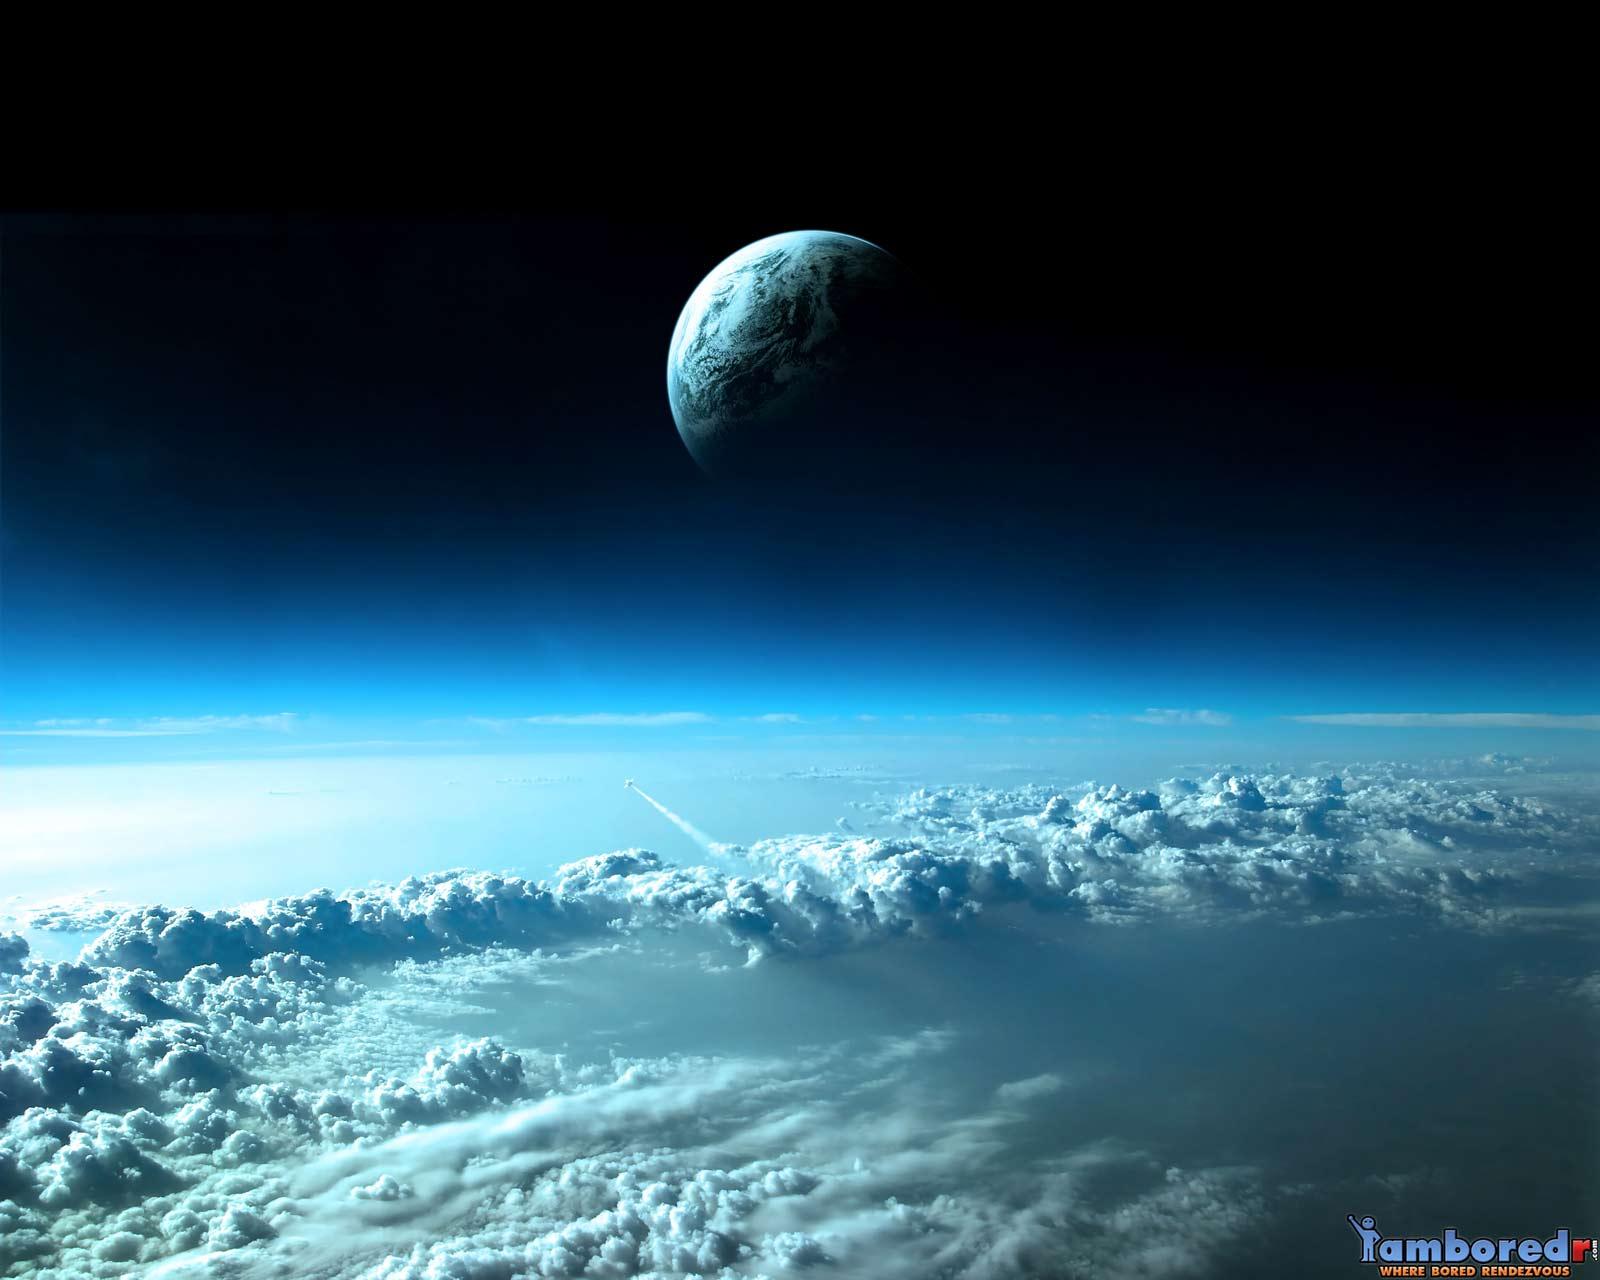 Galaxy Clouds by iamboredr1